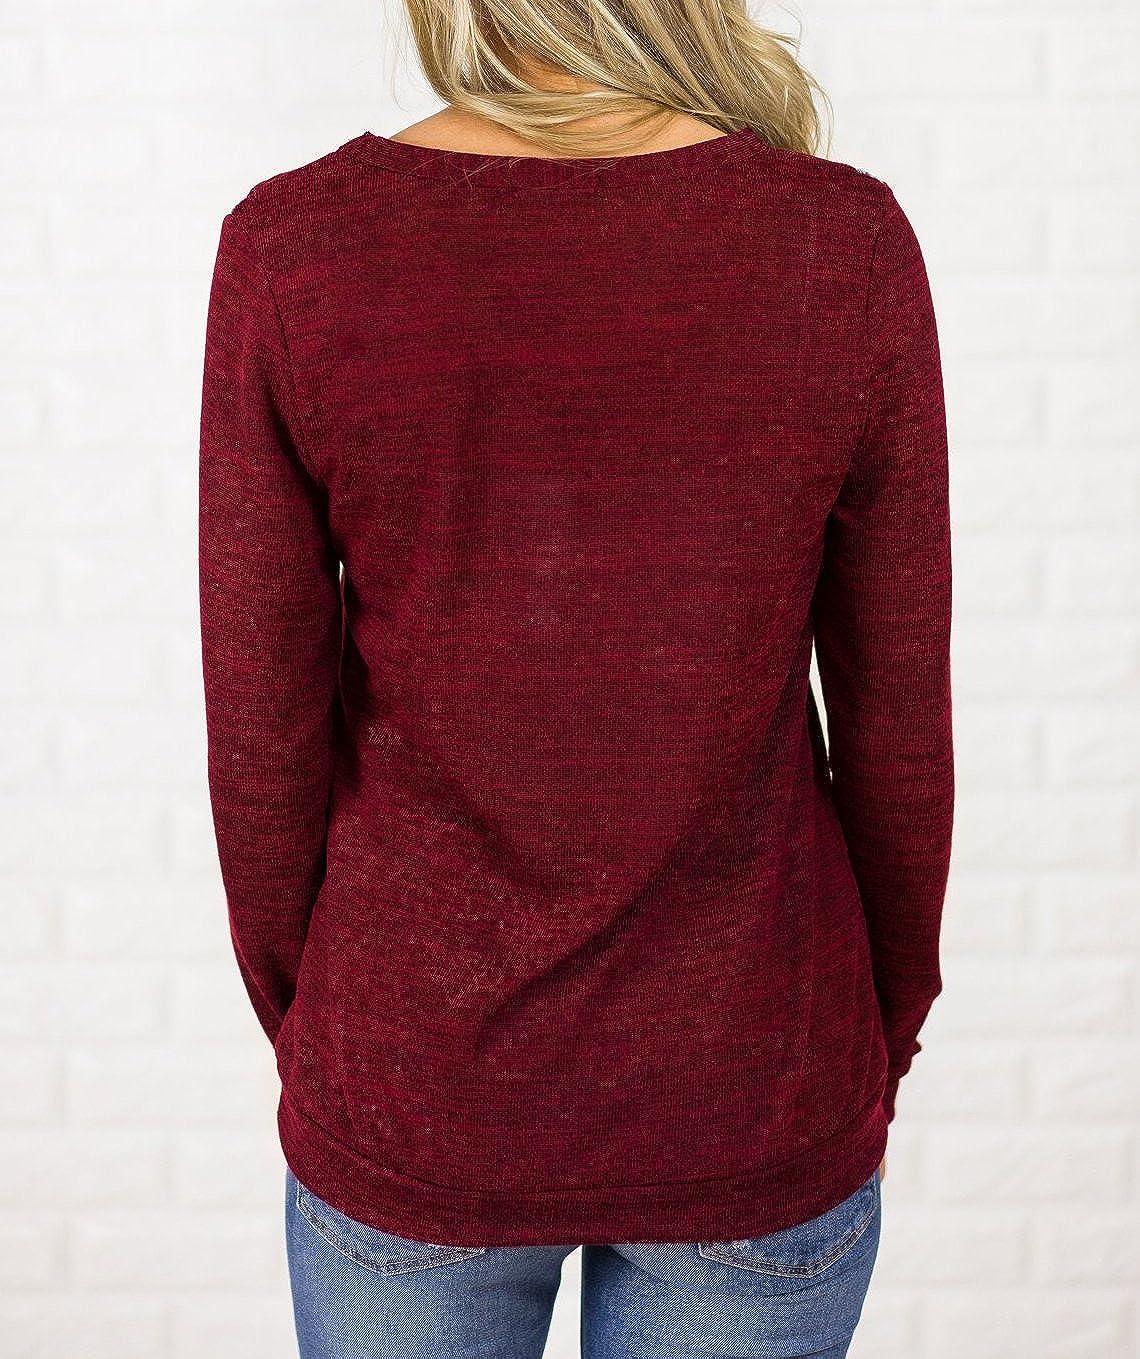 Pommaxe Damen Pullover Langarm Streifen Sweatshirt Herbst Oberteile Casual Strick